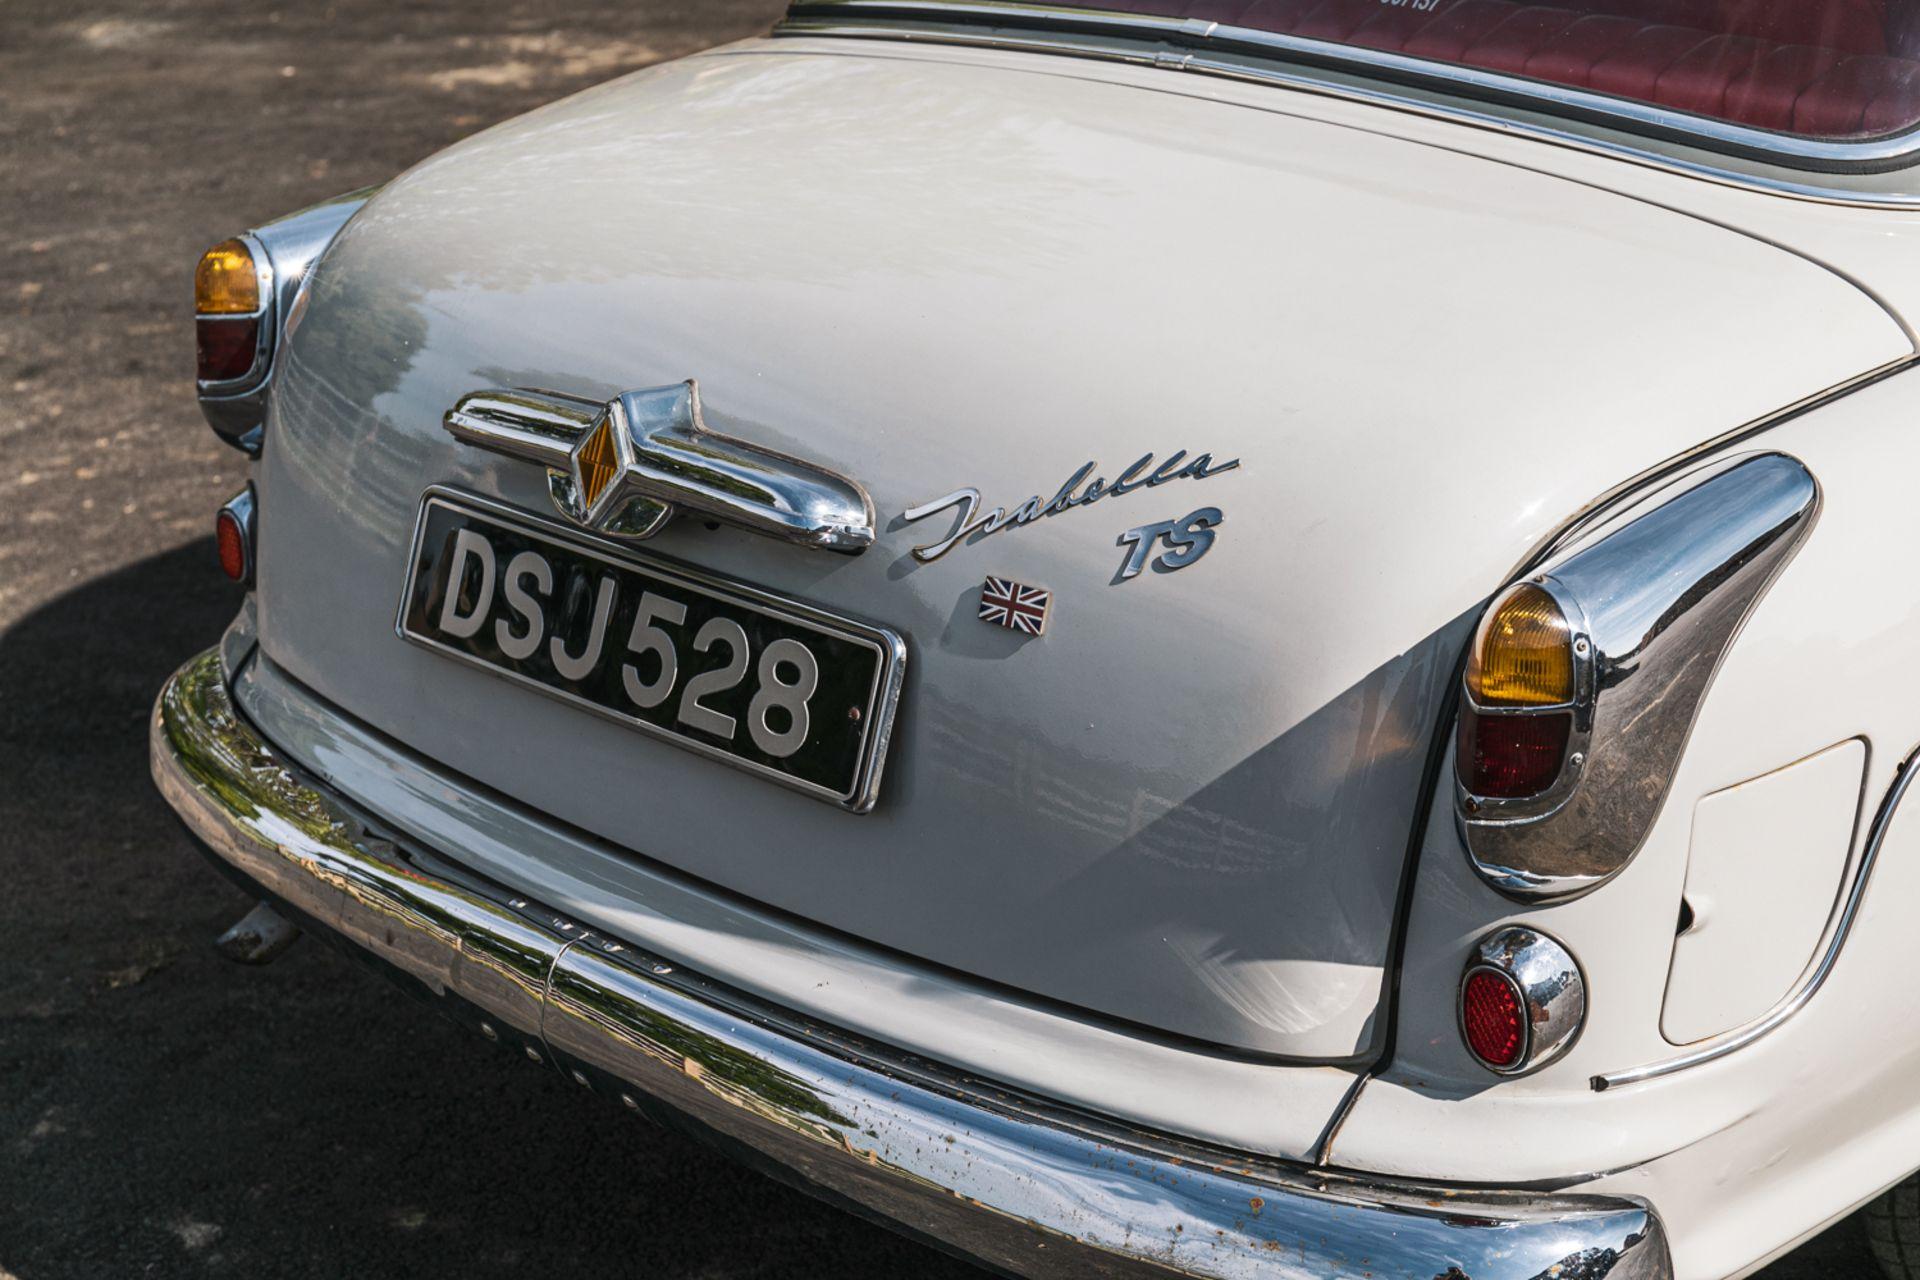 Lot 106 - 1958 Borgward Isabella TS Saloon